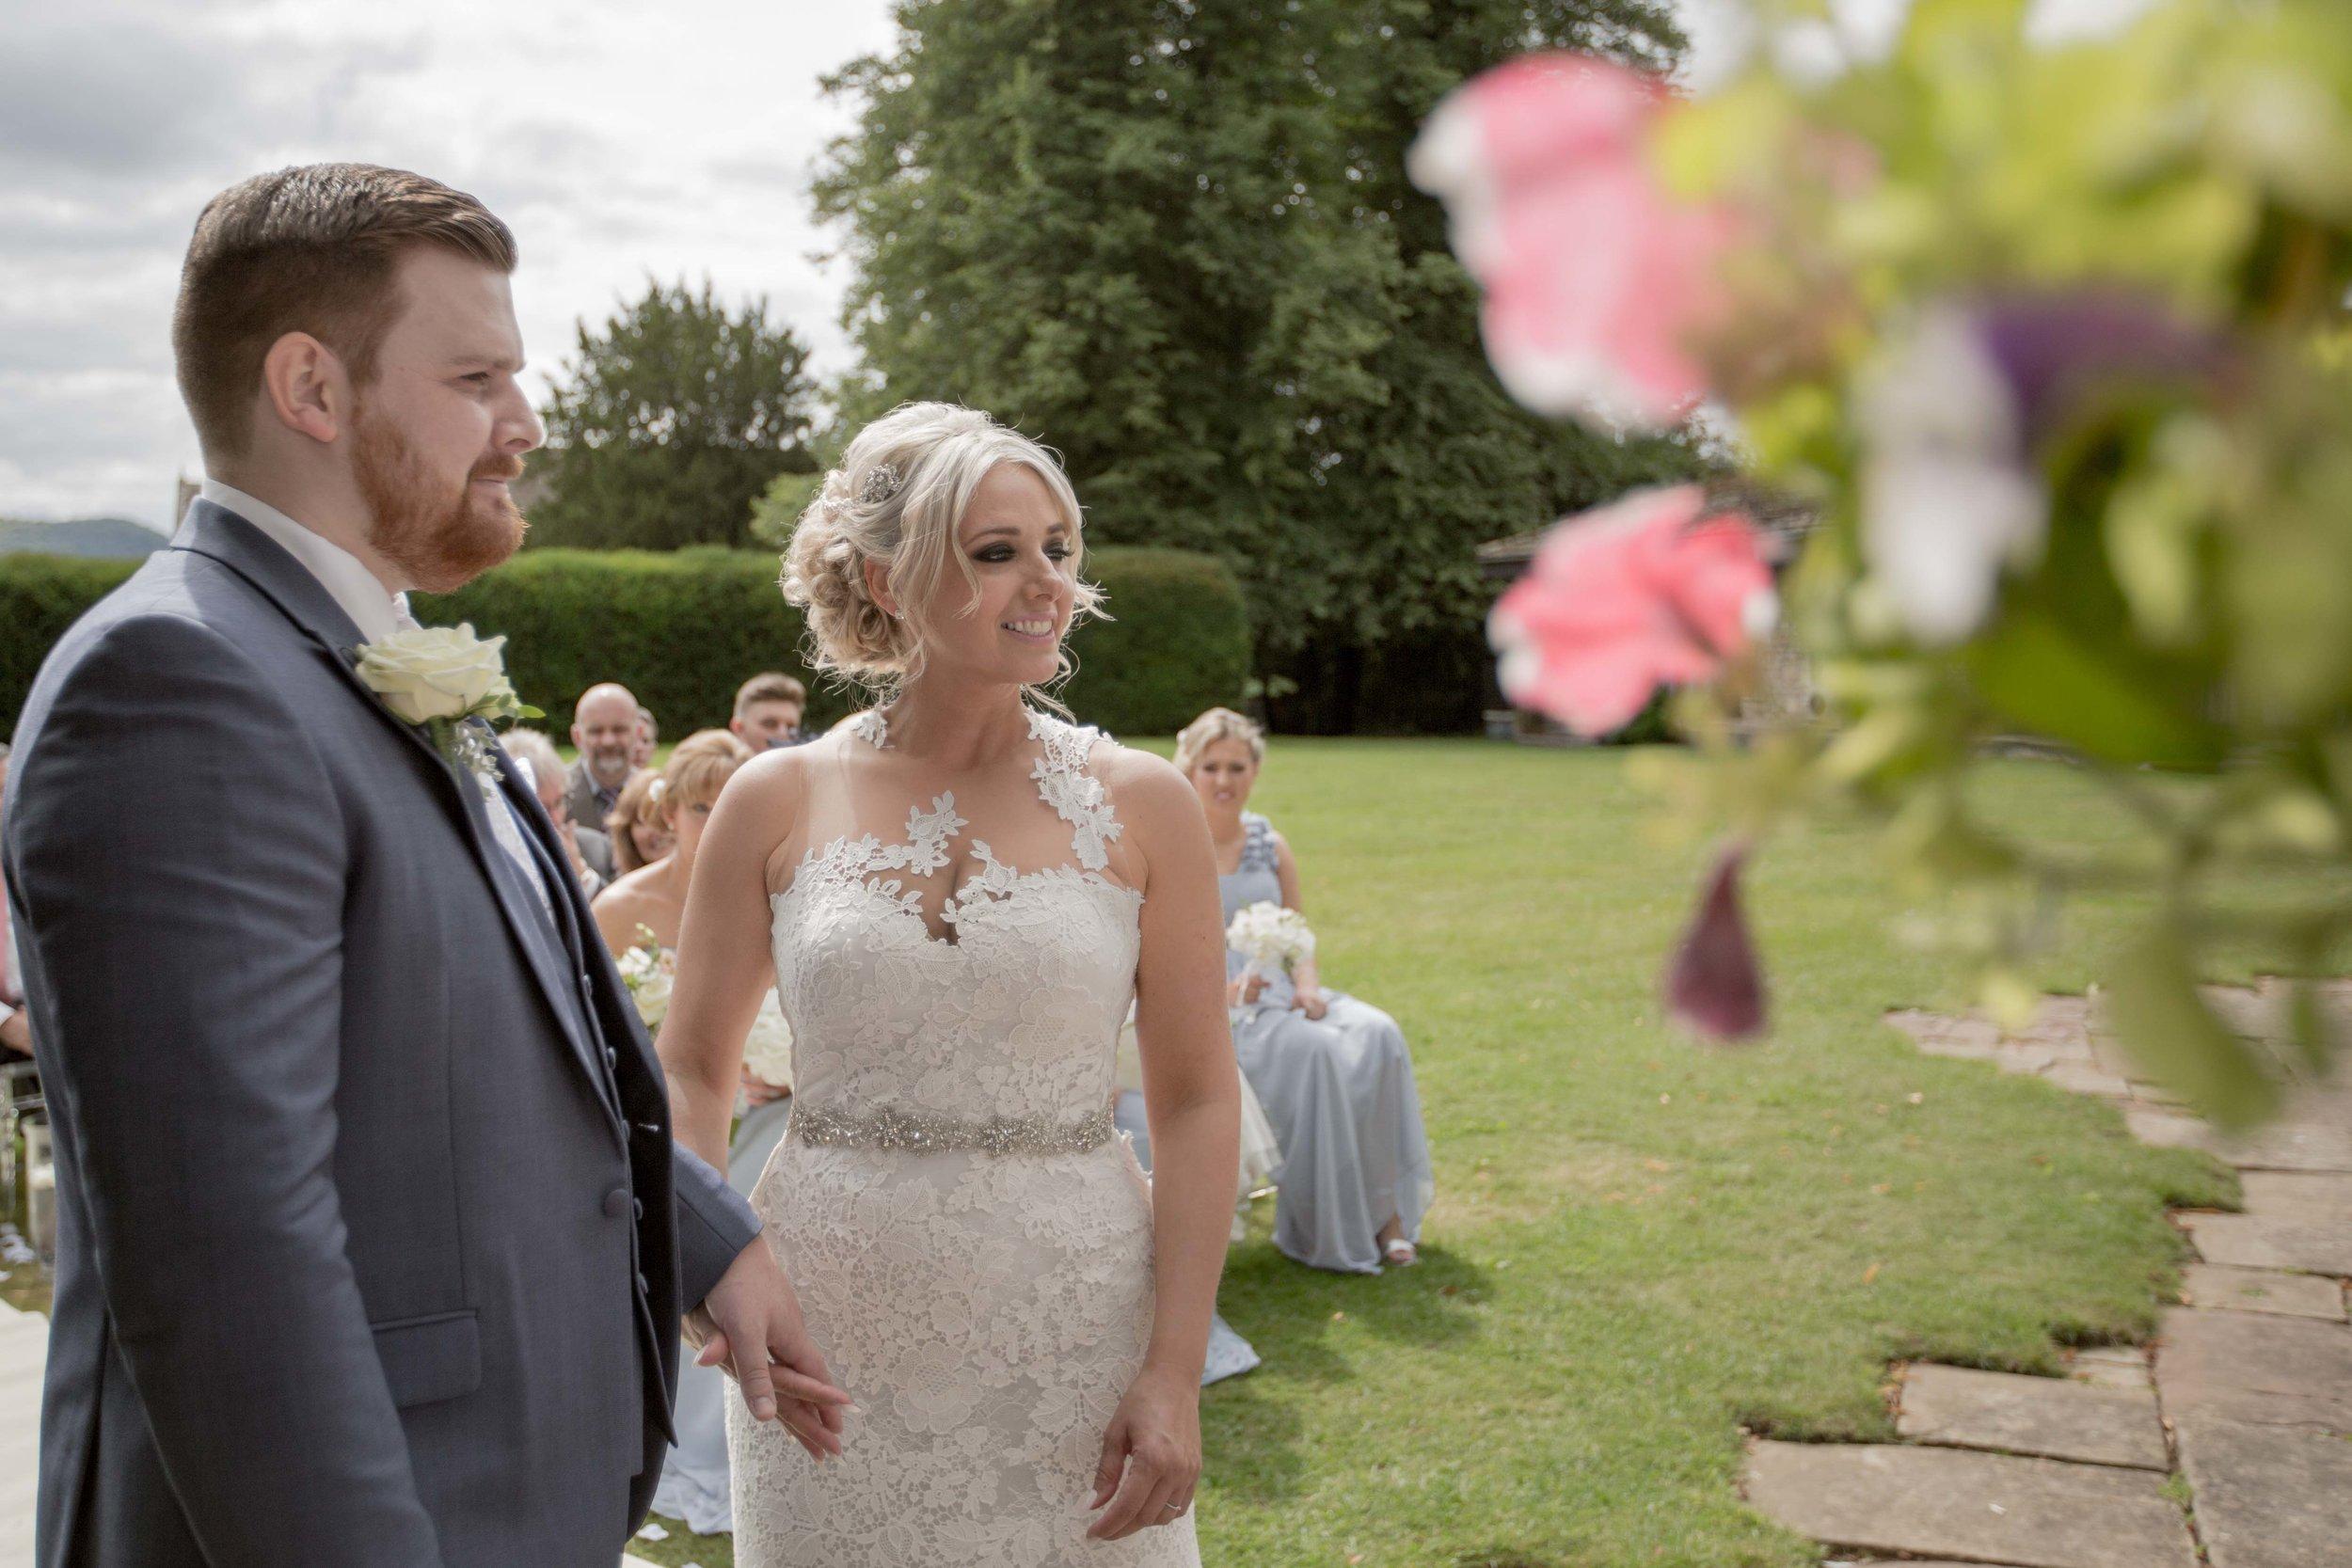 cotswold-wedding-photography-at-stonehouse-court-hotel-natalia-smith-photography-gloucestershire-wedding-photographer-41.jpg